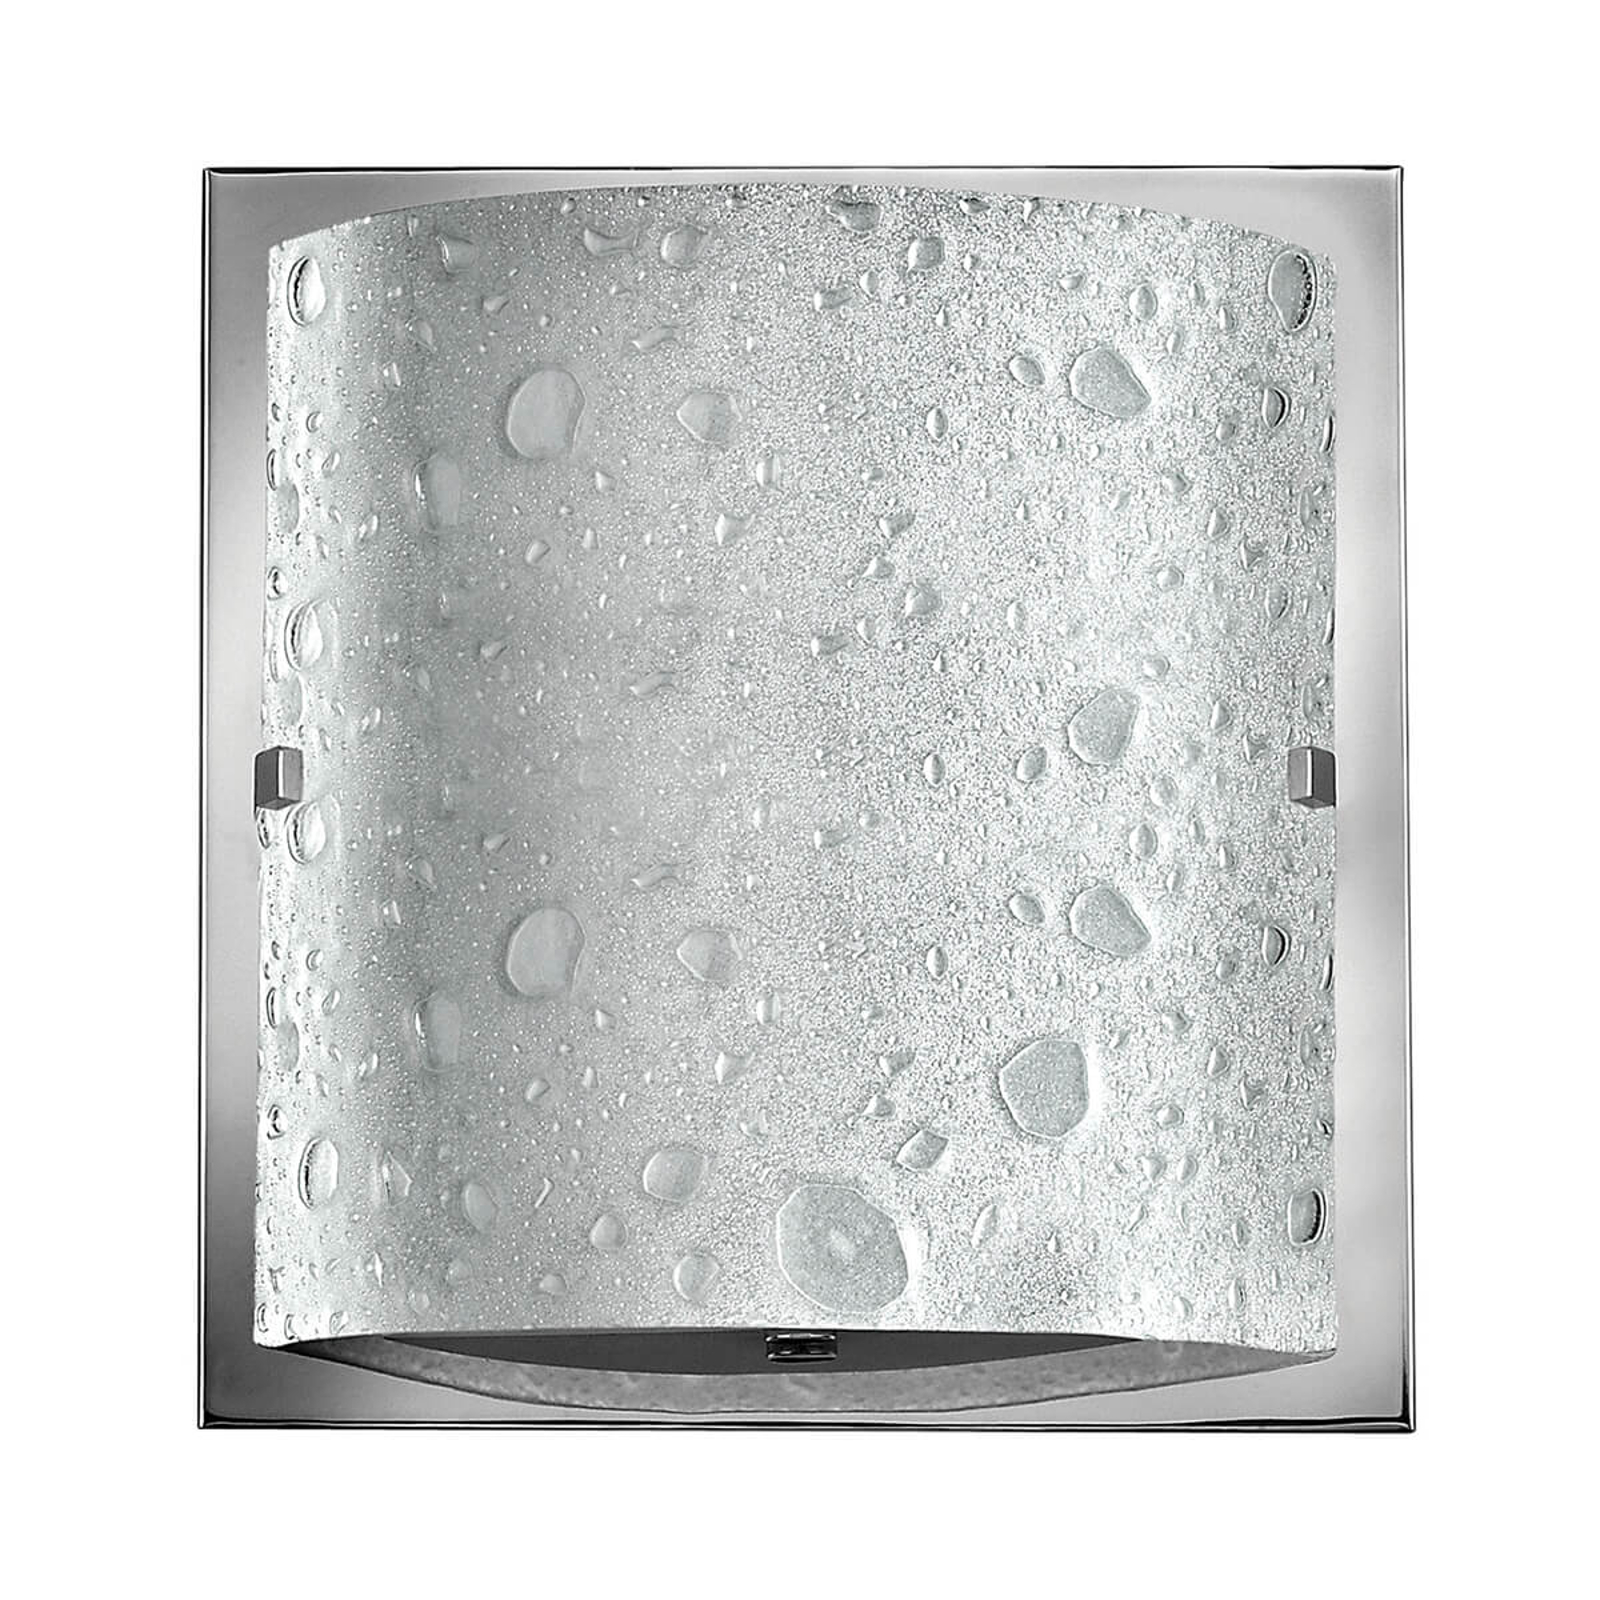 Acquista Applique LED Daphne per il bagno, 1 luce